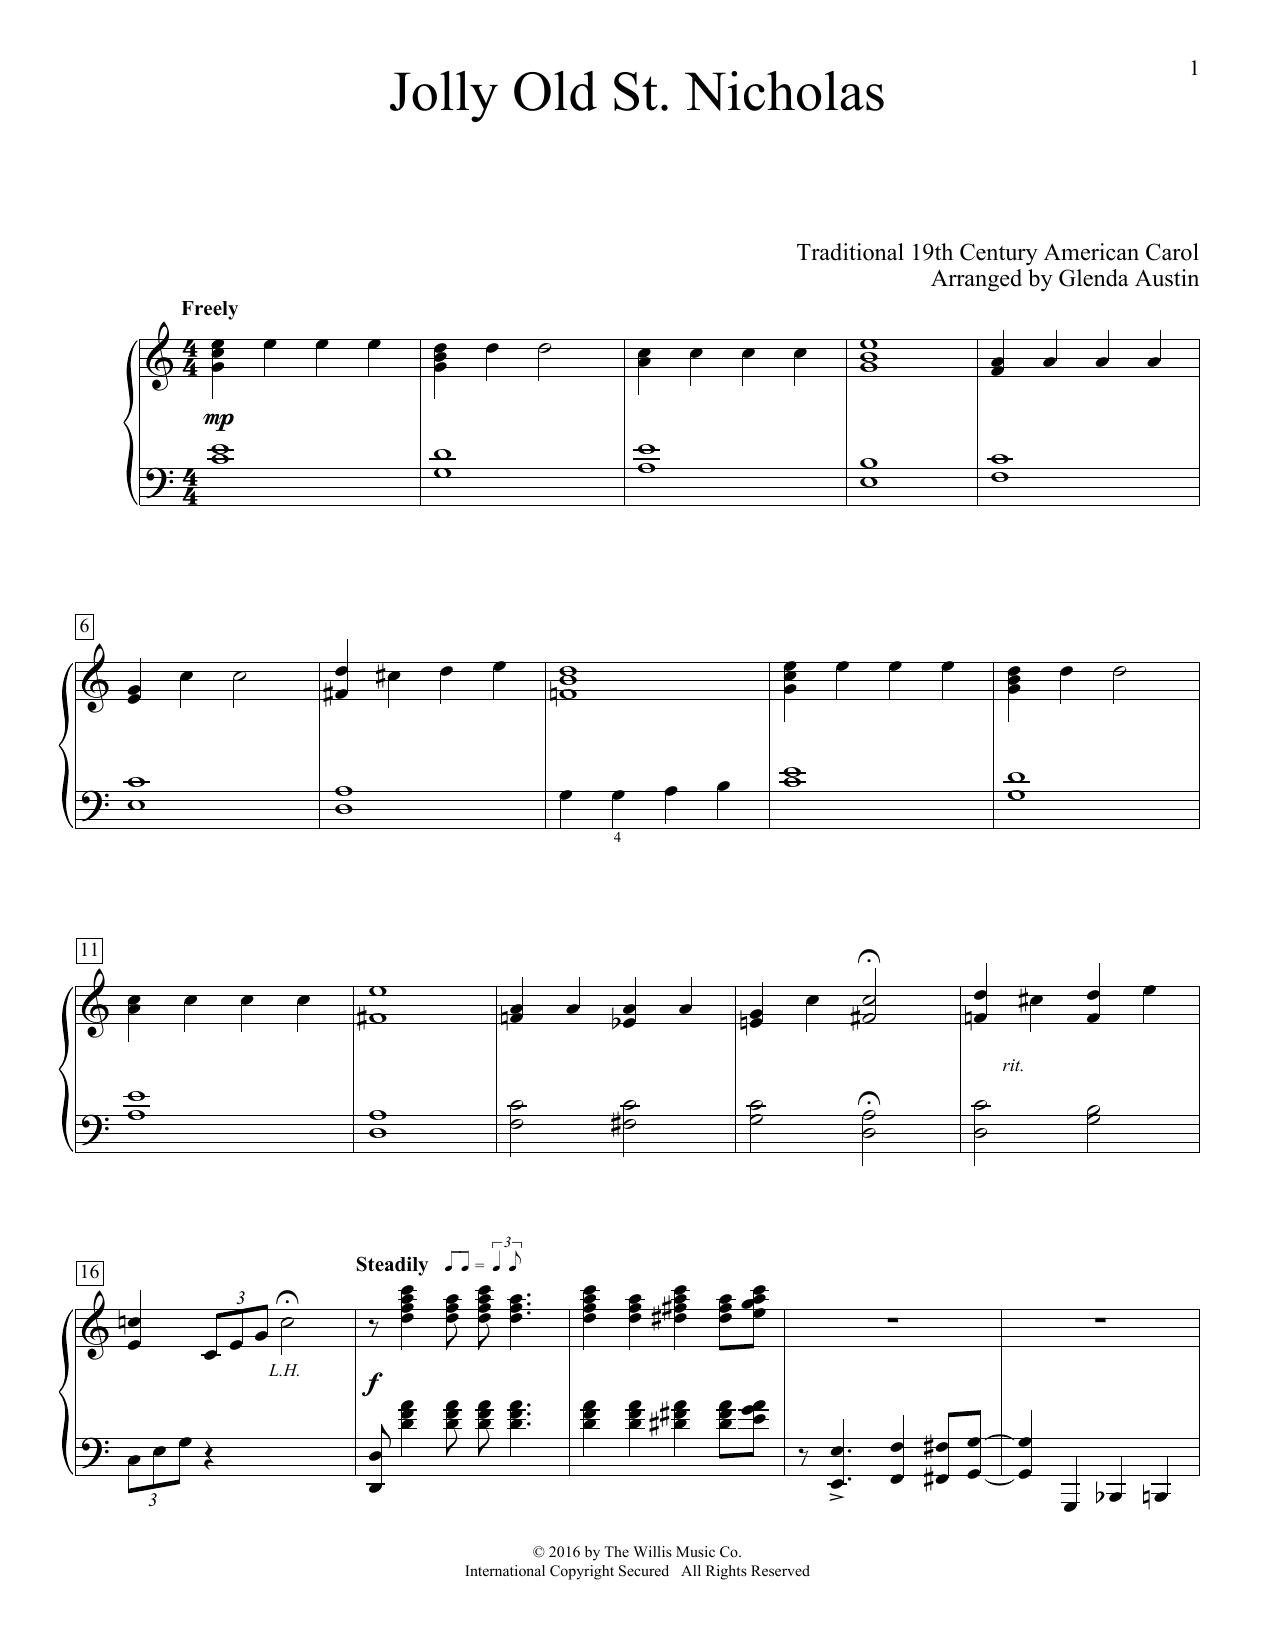 Glenda Austin Jolly Old St. Nicholas sheet music notes and chords. Download Printable PDF.